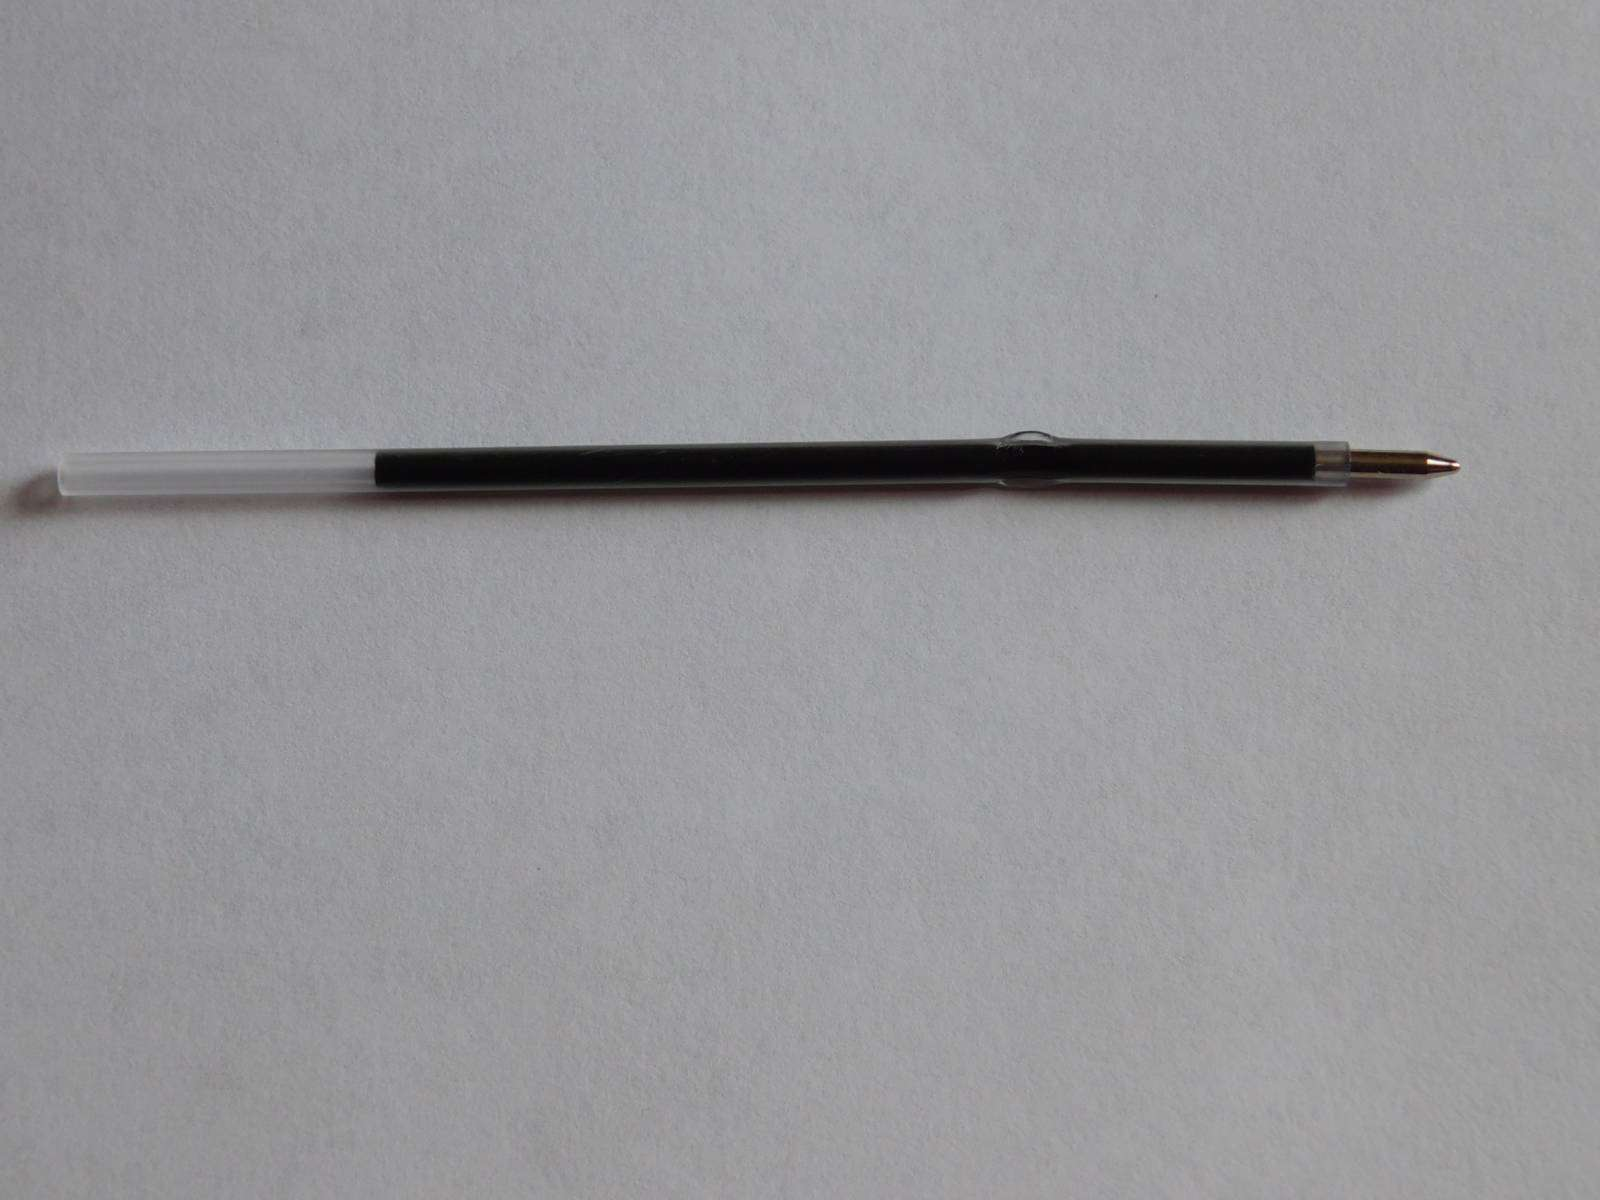 GearBest: Шариковая ручка в форме шприца для медика